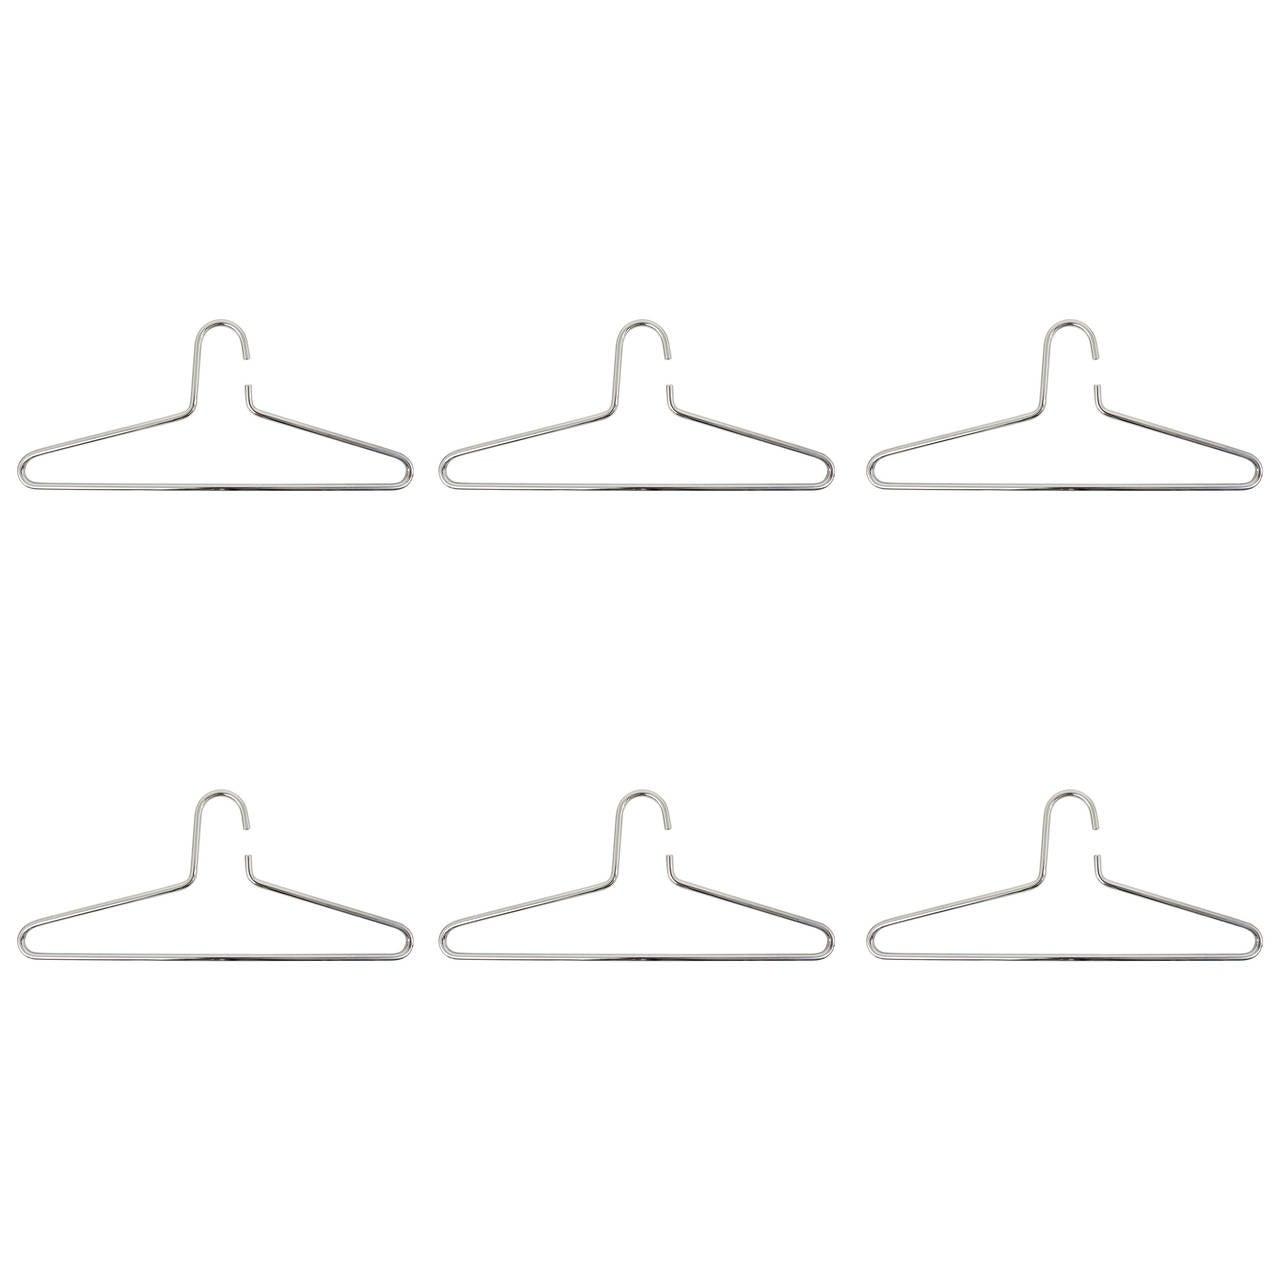 Set of Six Carl Auböck Chrome-Plated Hangers, Austria, 1970s